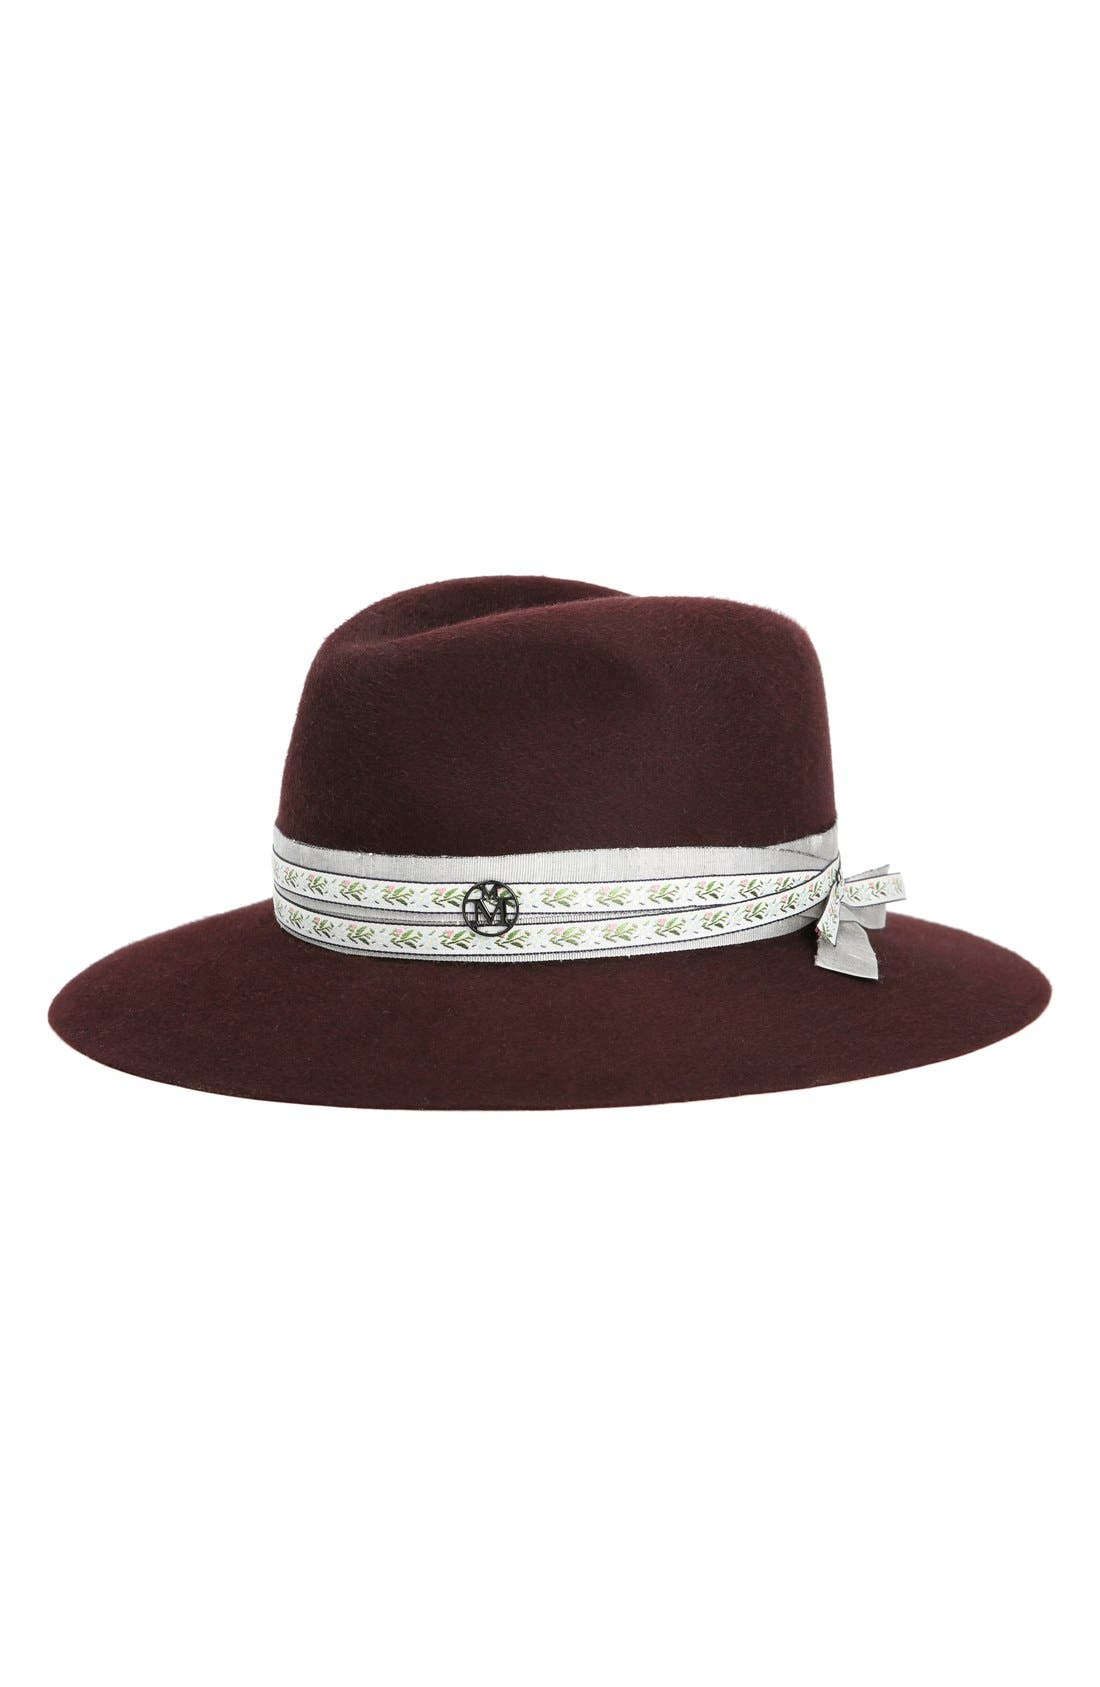 Main Image - Maison Michel Henrietta Fur Felt Hat